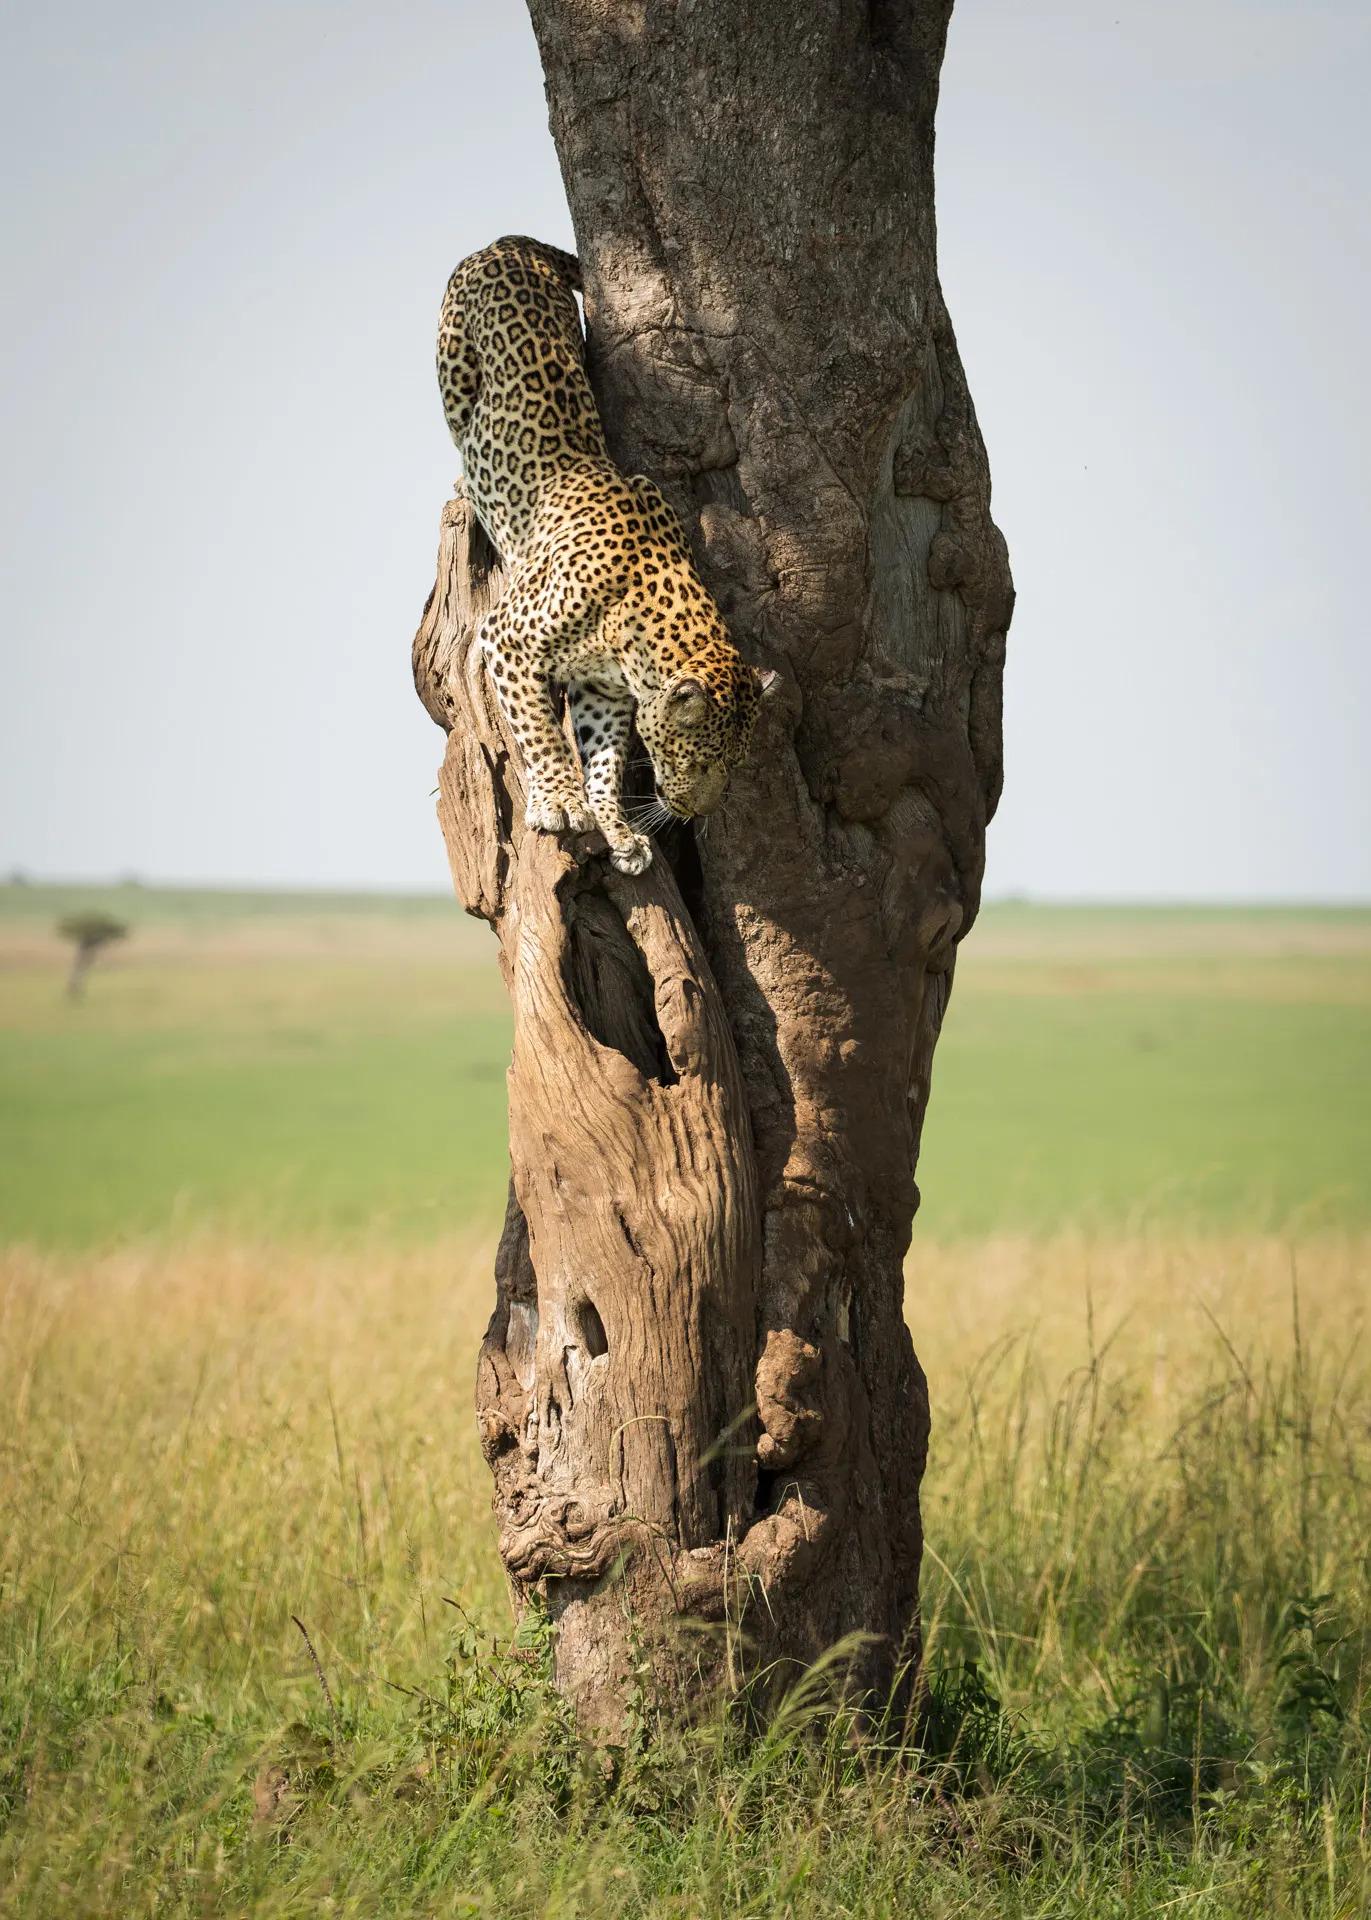 Leopard descending tree